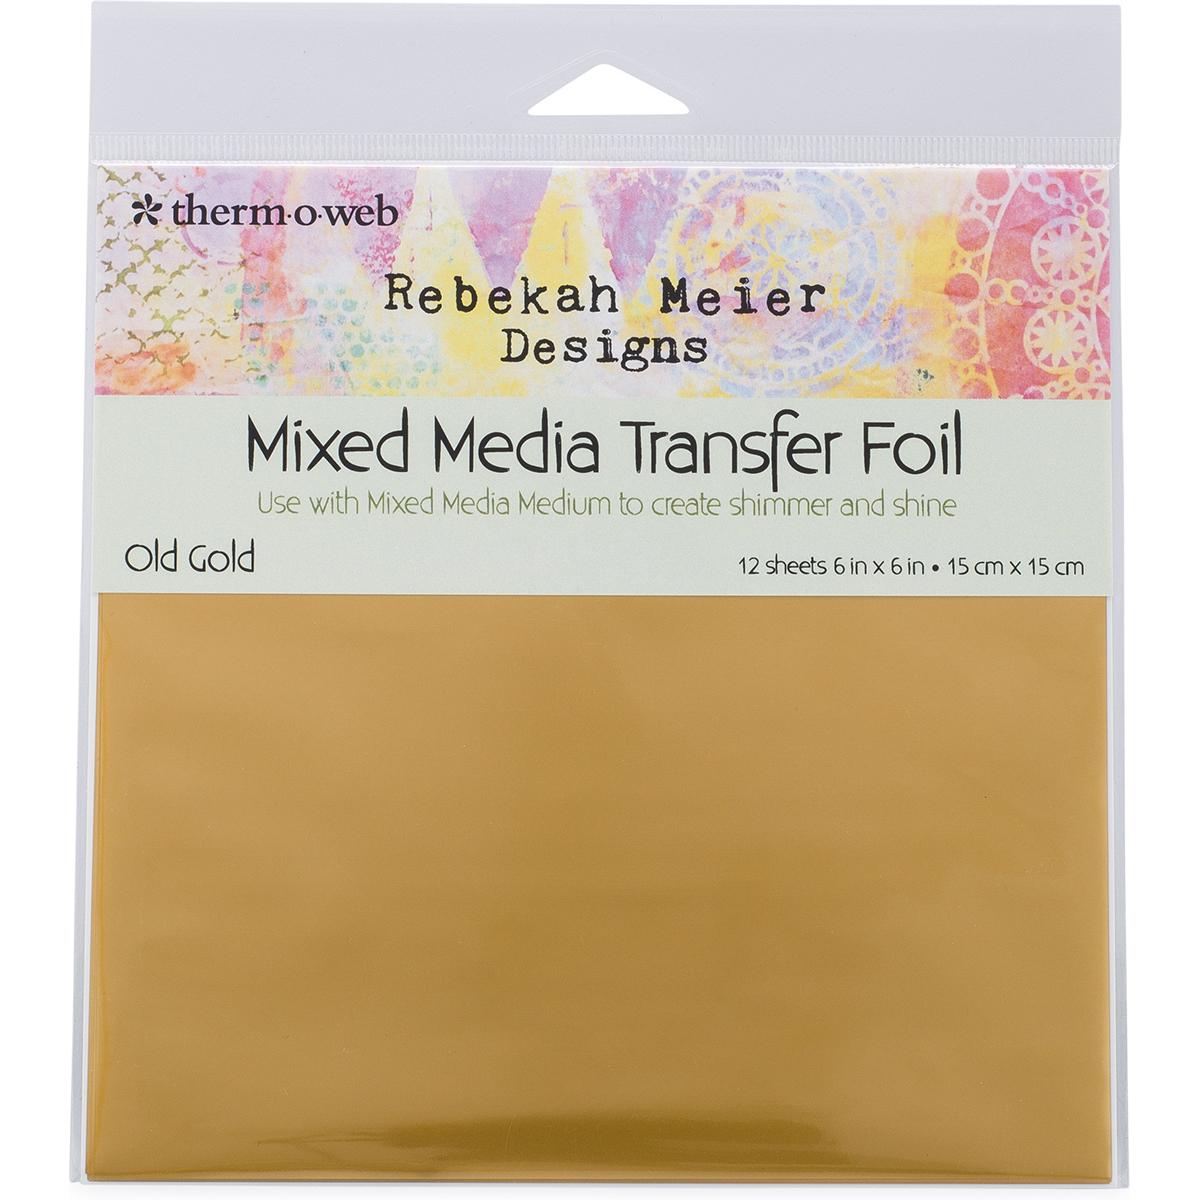 "Thermoweb Rebekah Meier Designs Transfer Foil 6""X6"" 12/Pkg-Old Gold"